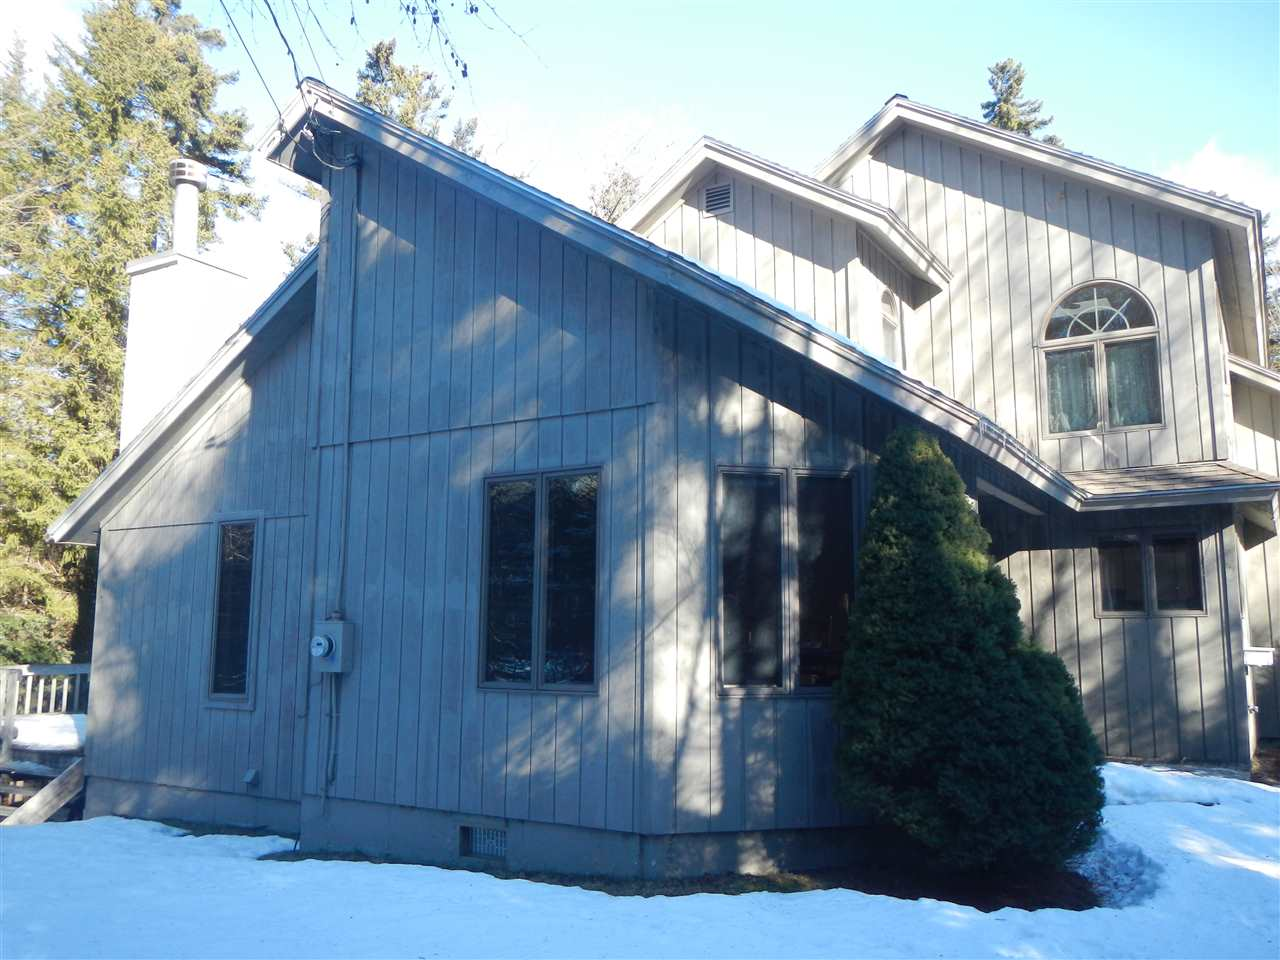 Mount-Snow-Real-Estate-4614310-23